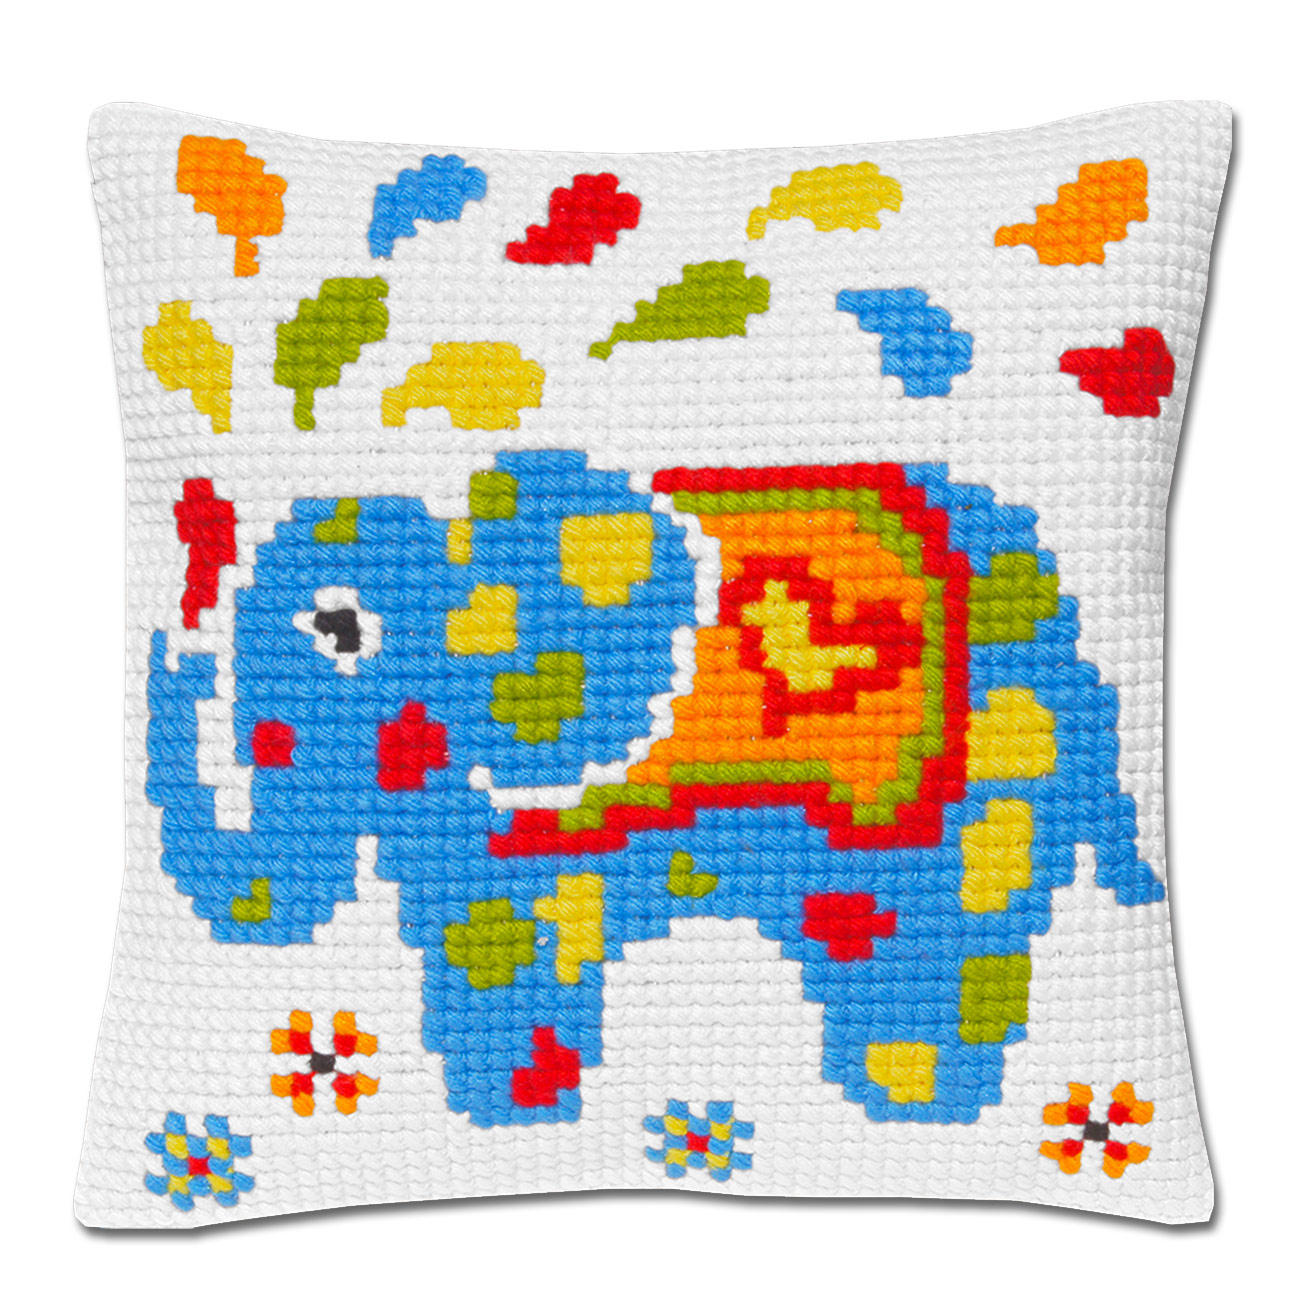 kreuzstich kissen elefant blau. Black Bedroom Furniture Sets. Home Design Ideas